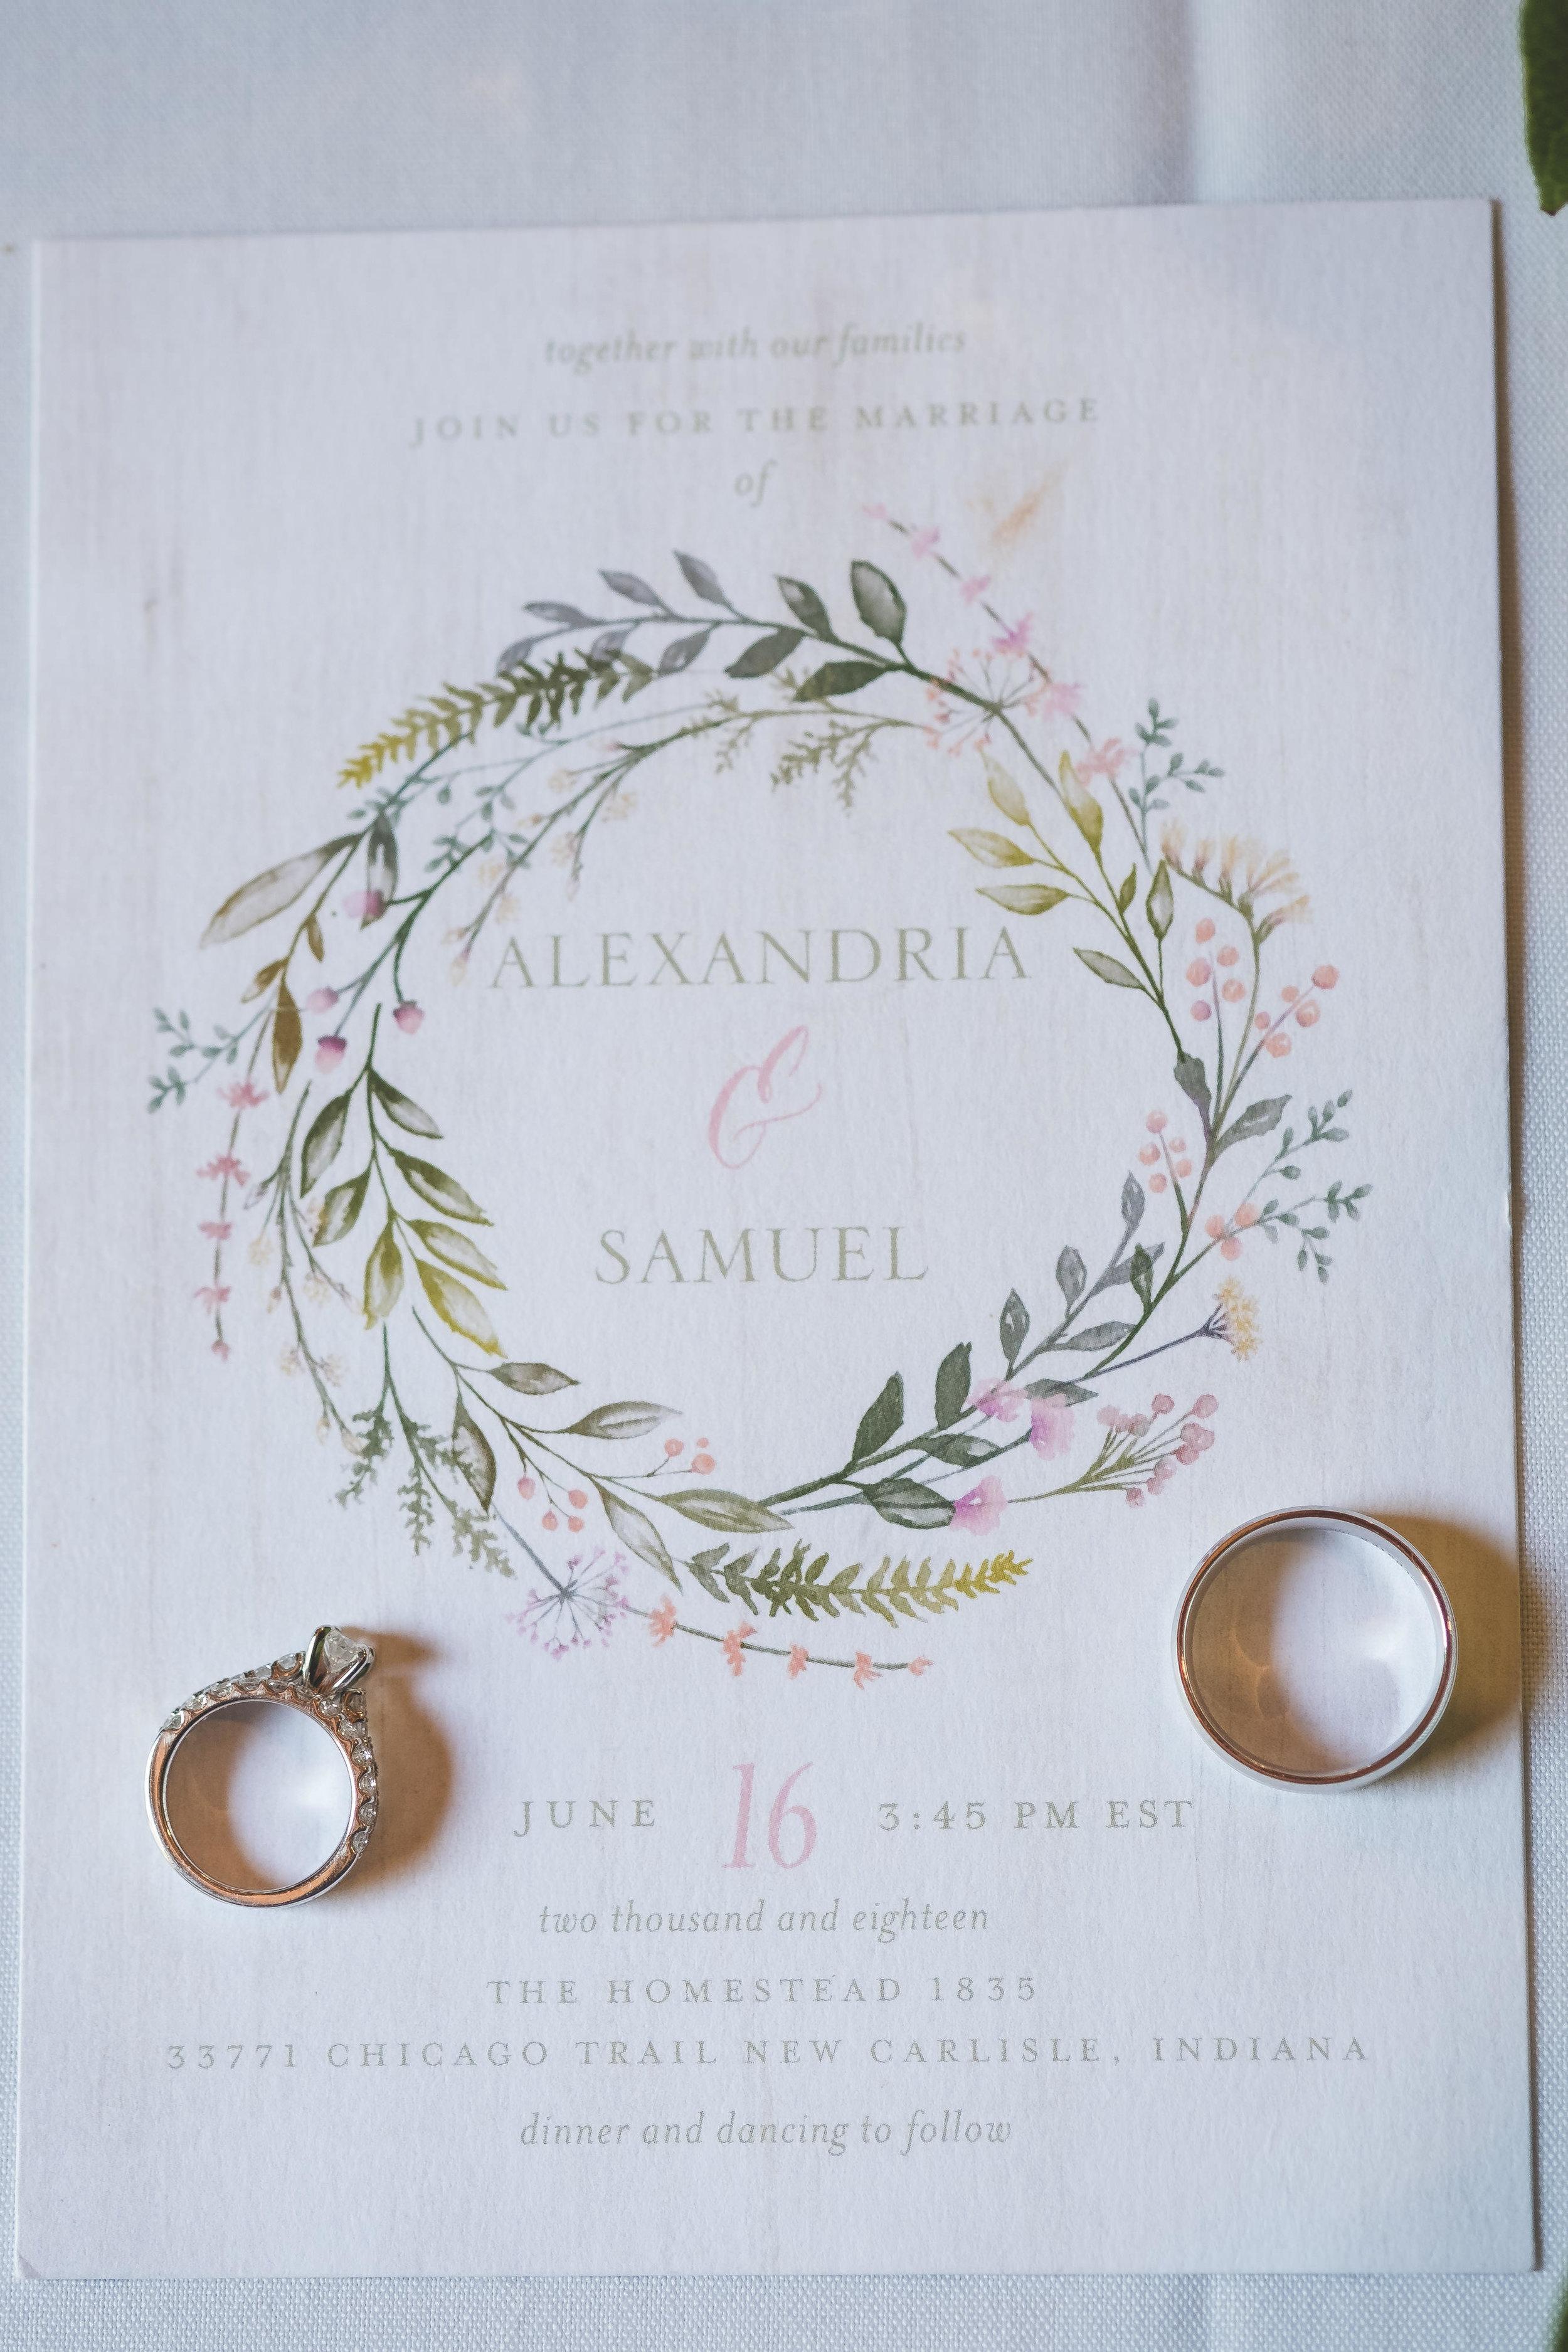 Sam & Alex's Homestead 1835 Wedding New Carlisle IN - www.RHatfieldPhotography.com